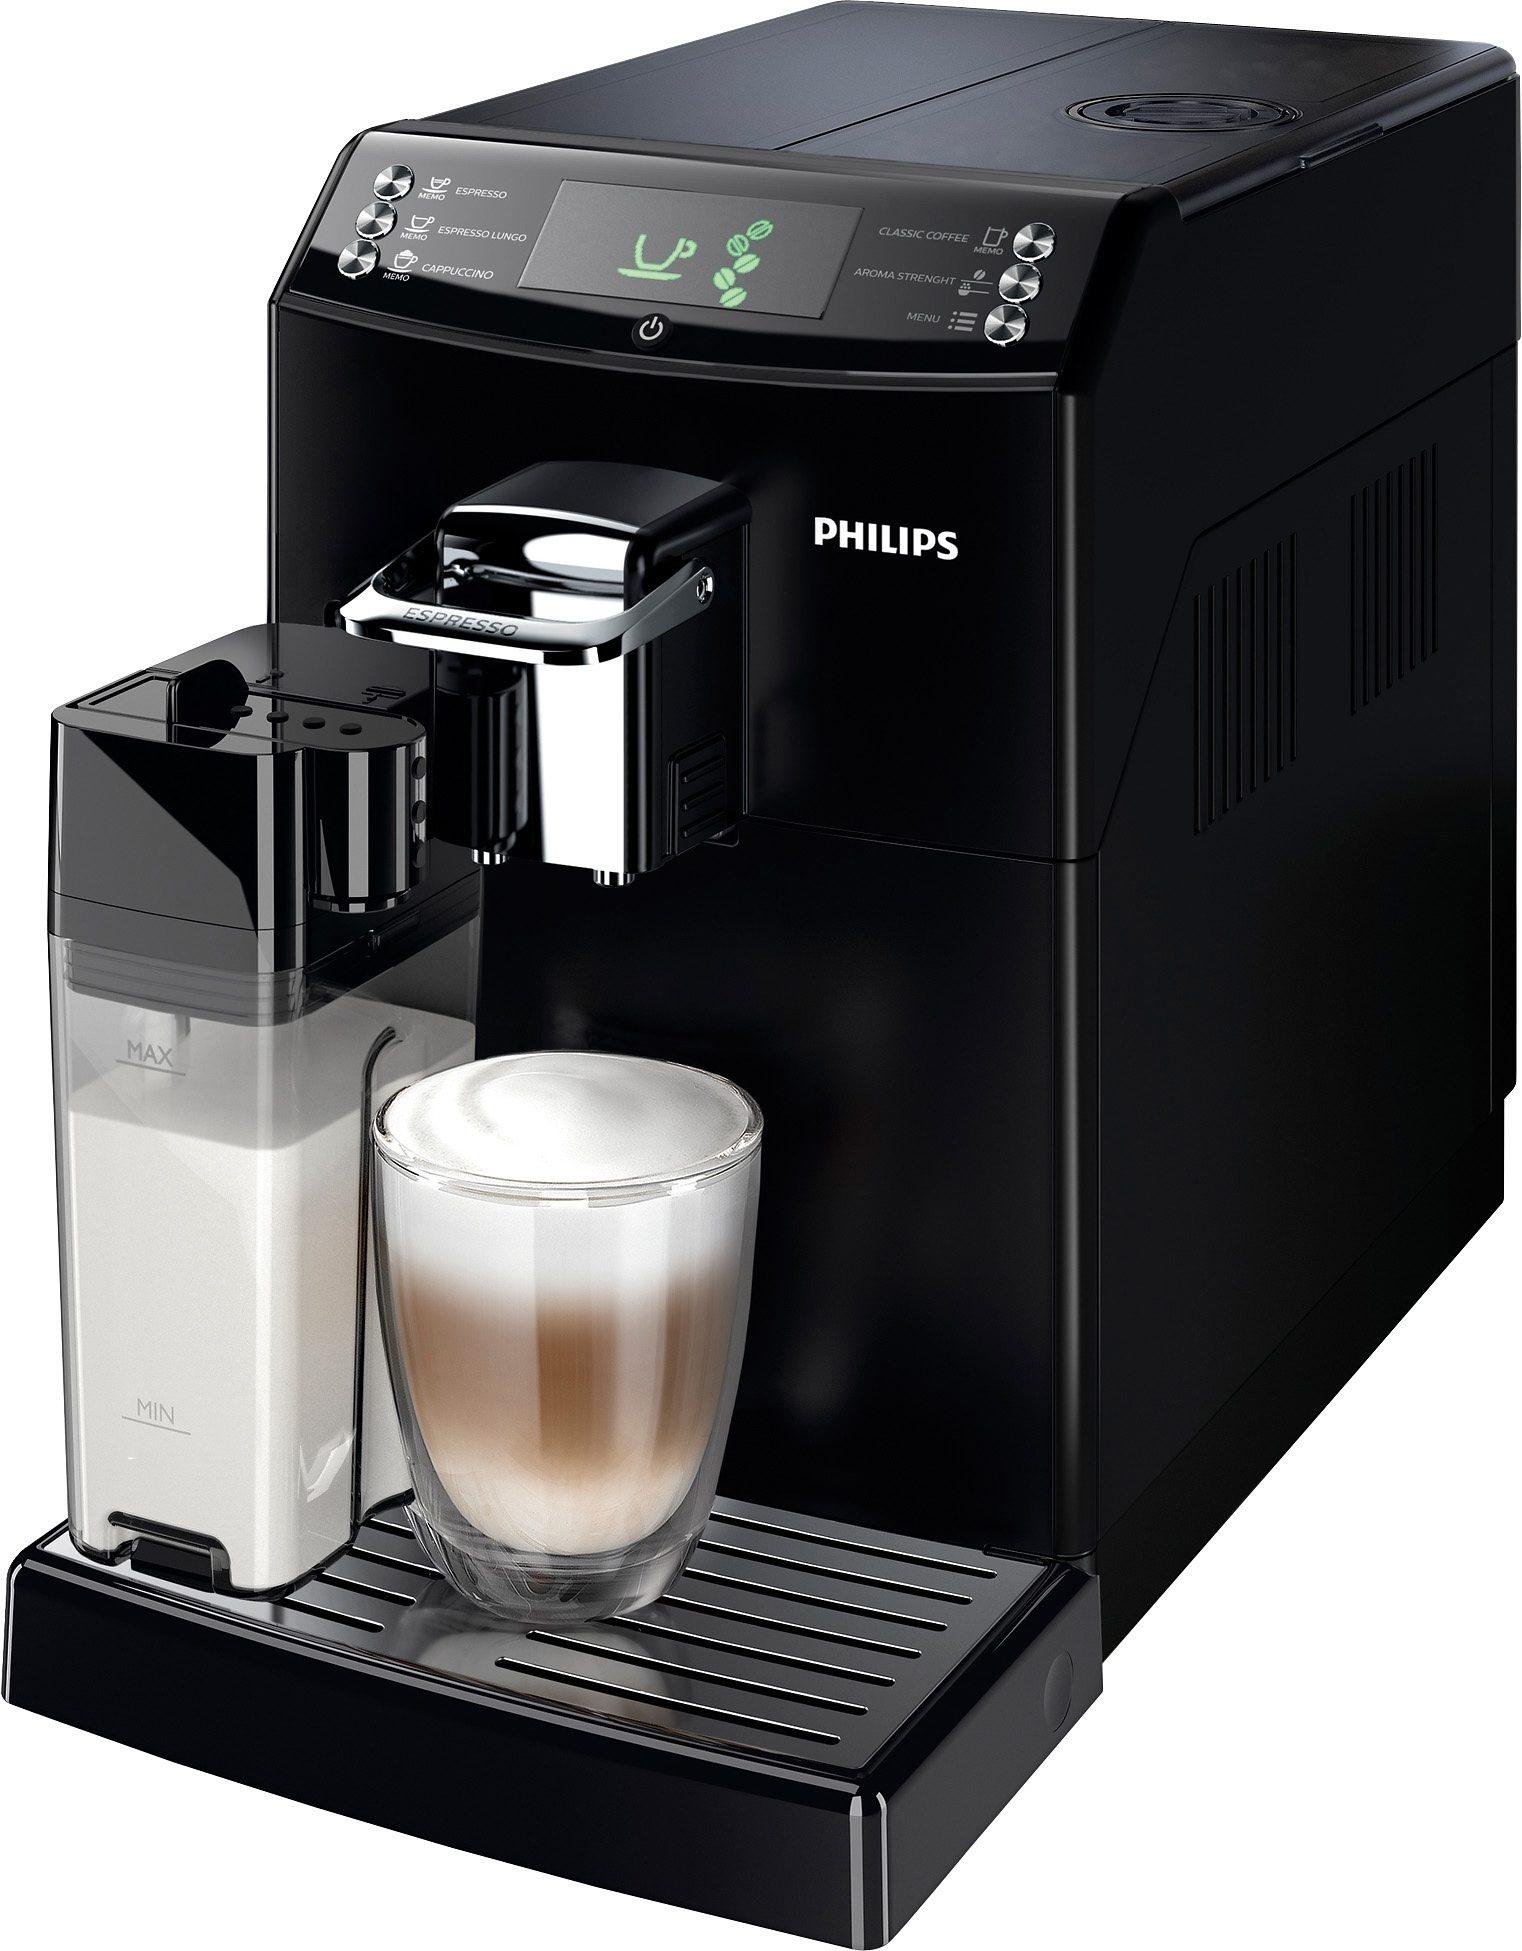 Philips Kaffeevollautomat 4000 Series HD8847/01 mit CoffeeSwitch™ und Milchkaraffe